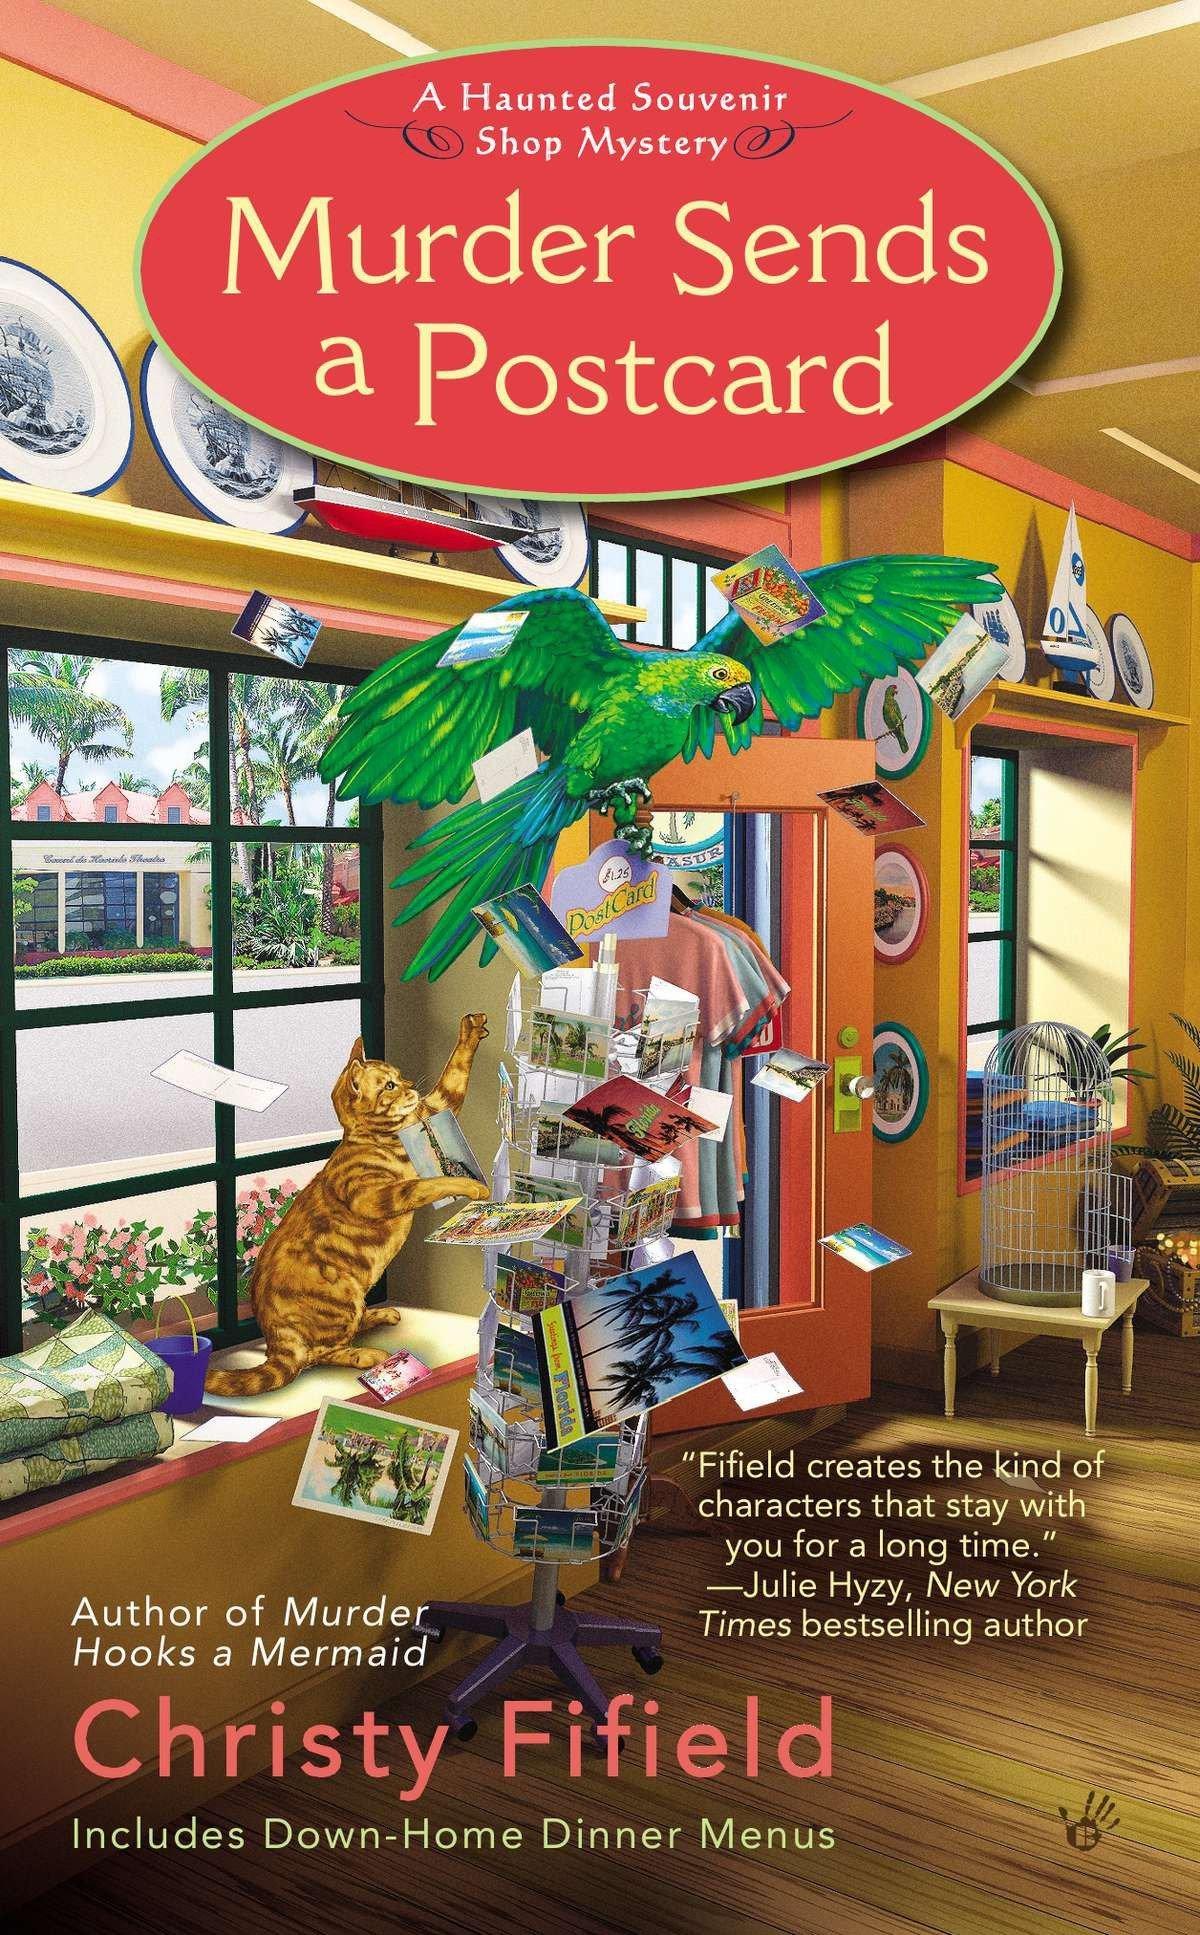 Murder Sends a Postcard (Haunted Souvenir Shop) ebook